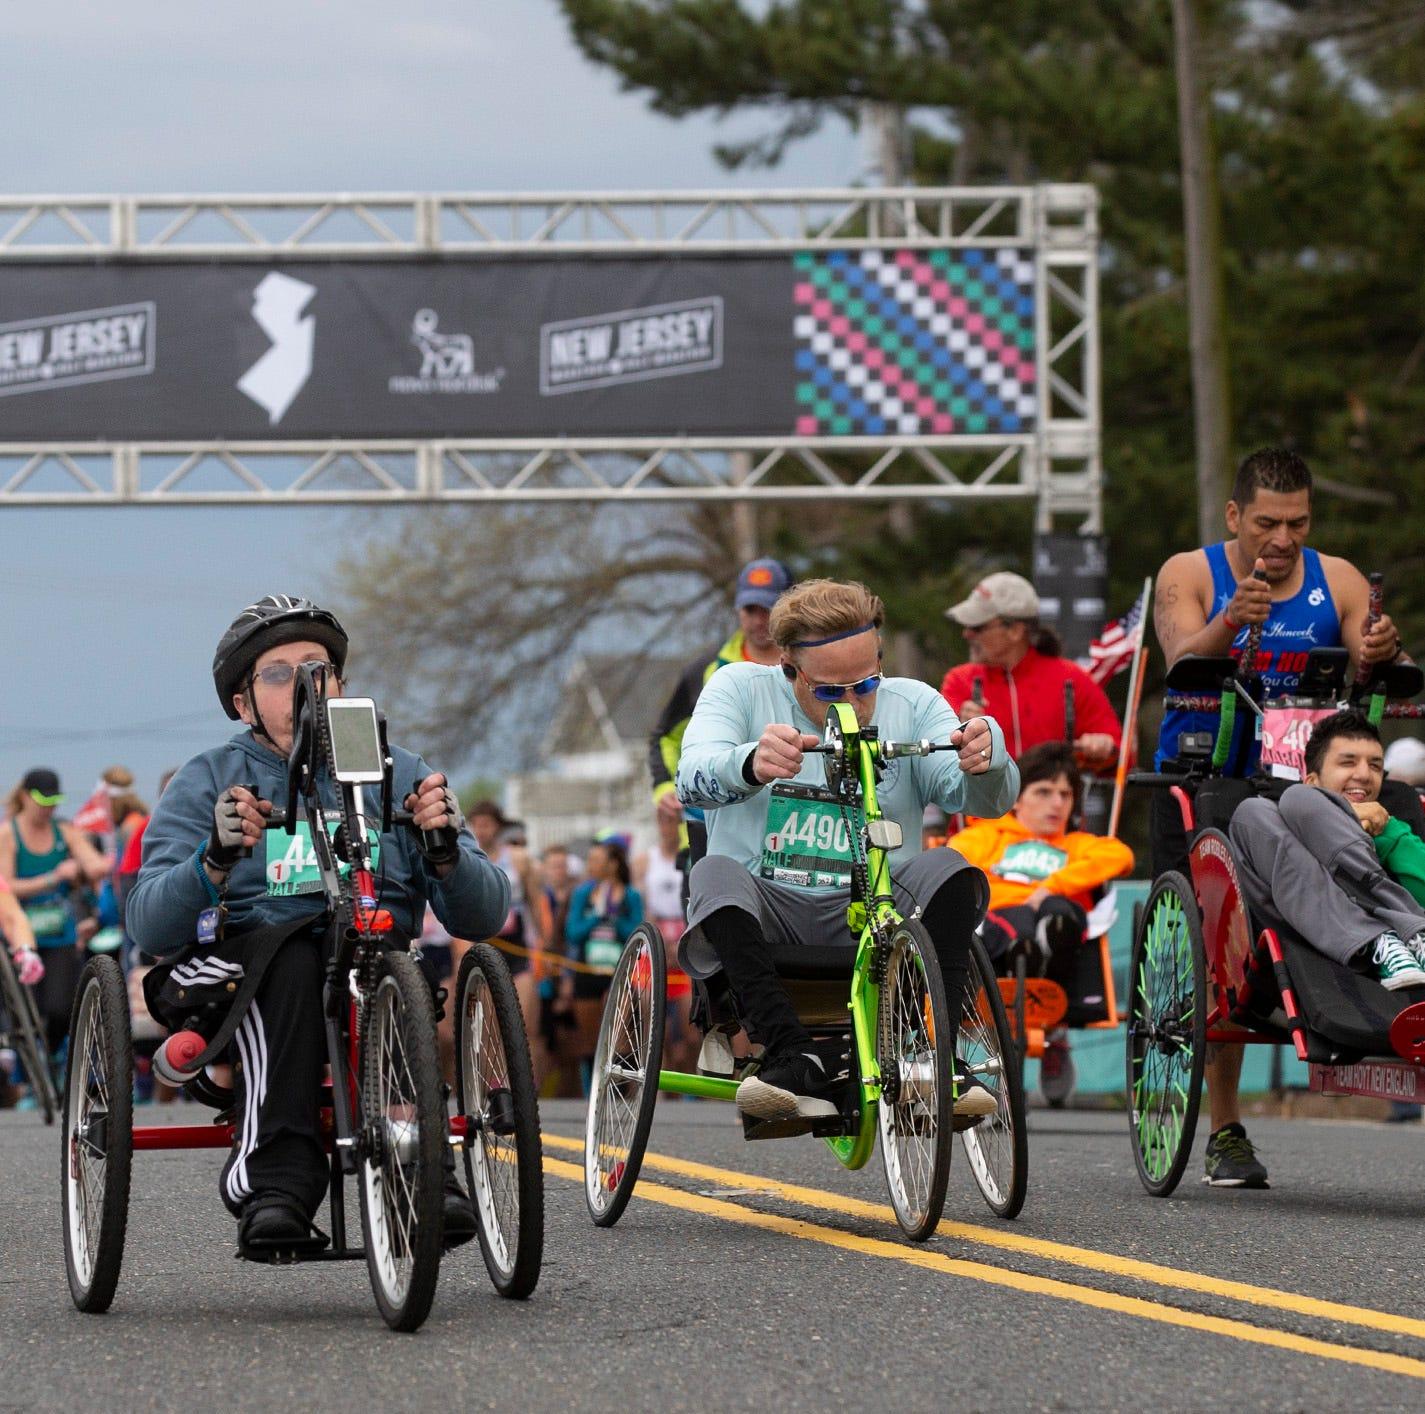 New Jersey Marathon 2019: Wheelchair athletes in spotlight